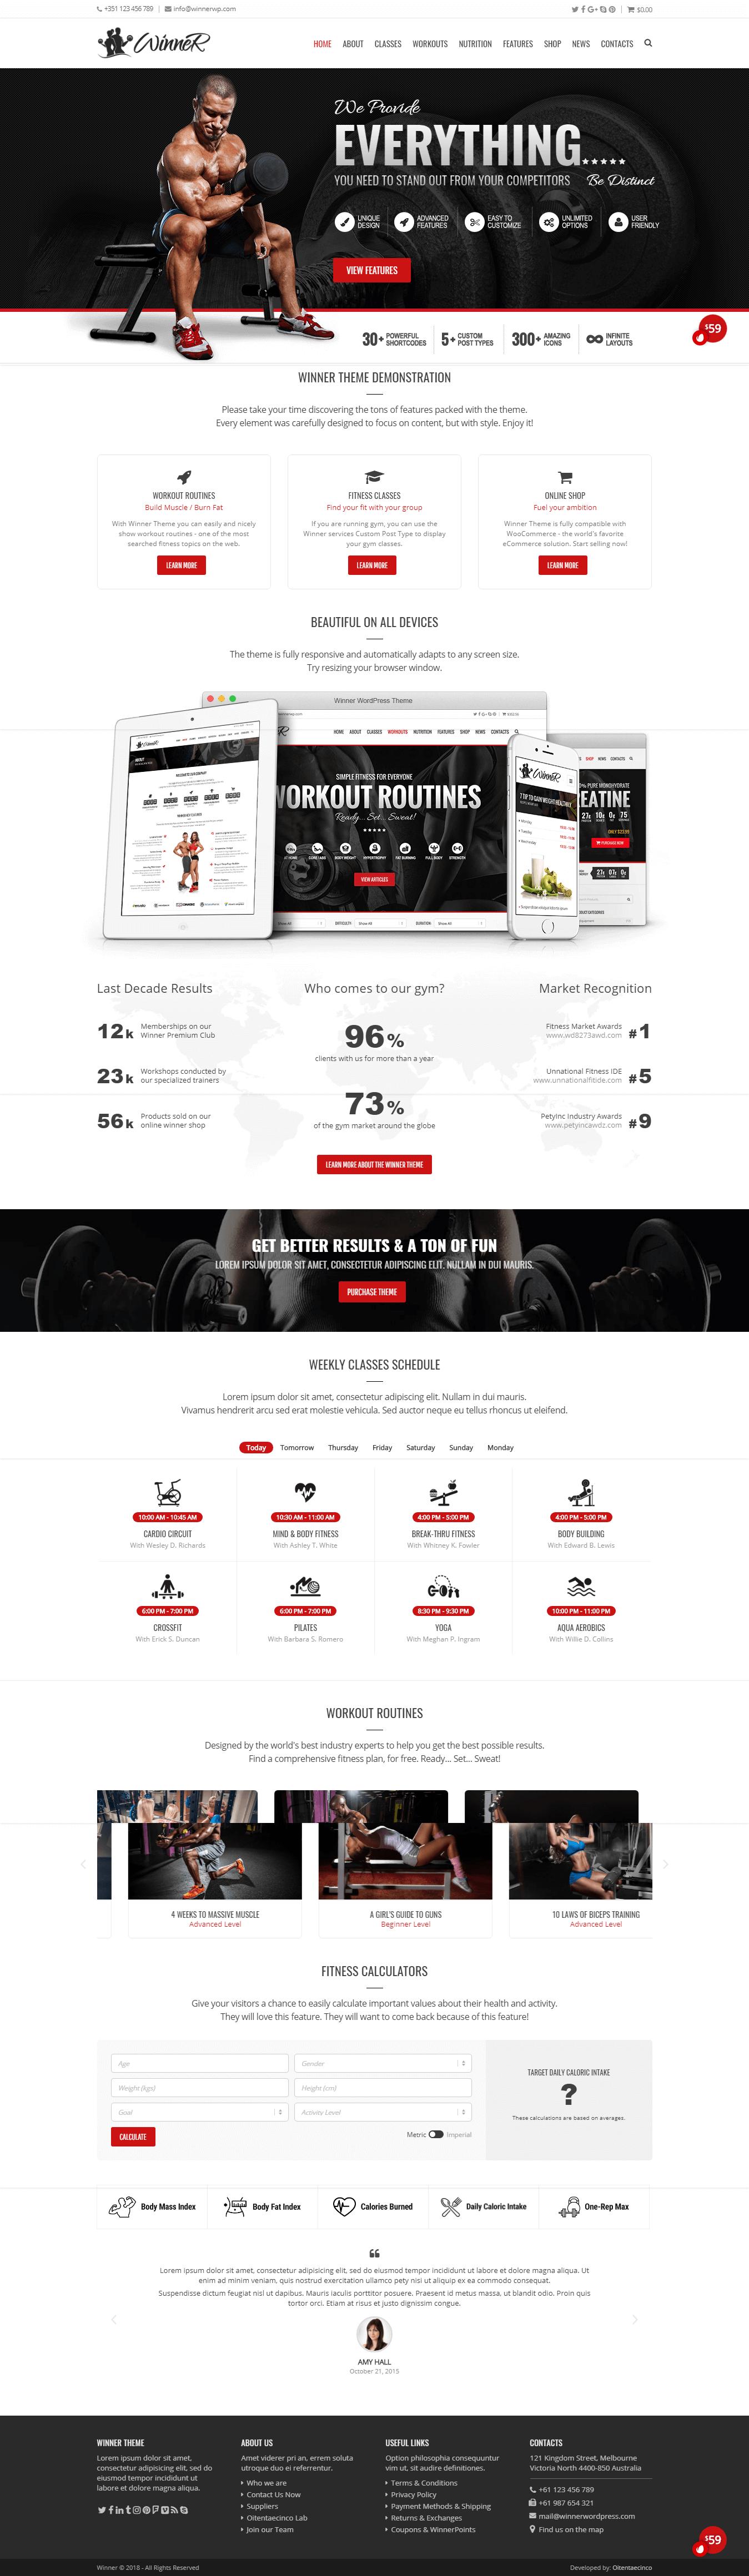 winner best premium sports wordpress theme - 10+ Best Premium Sports WordPress Themes